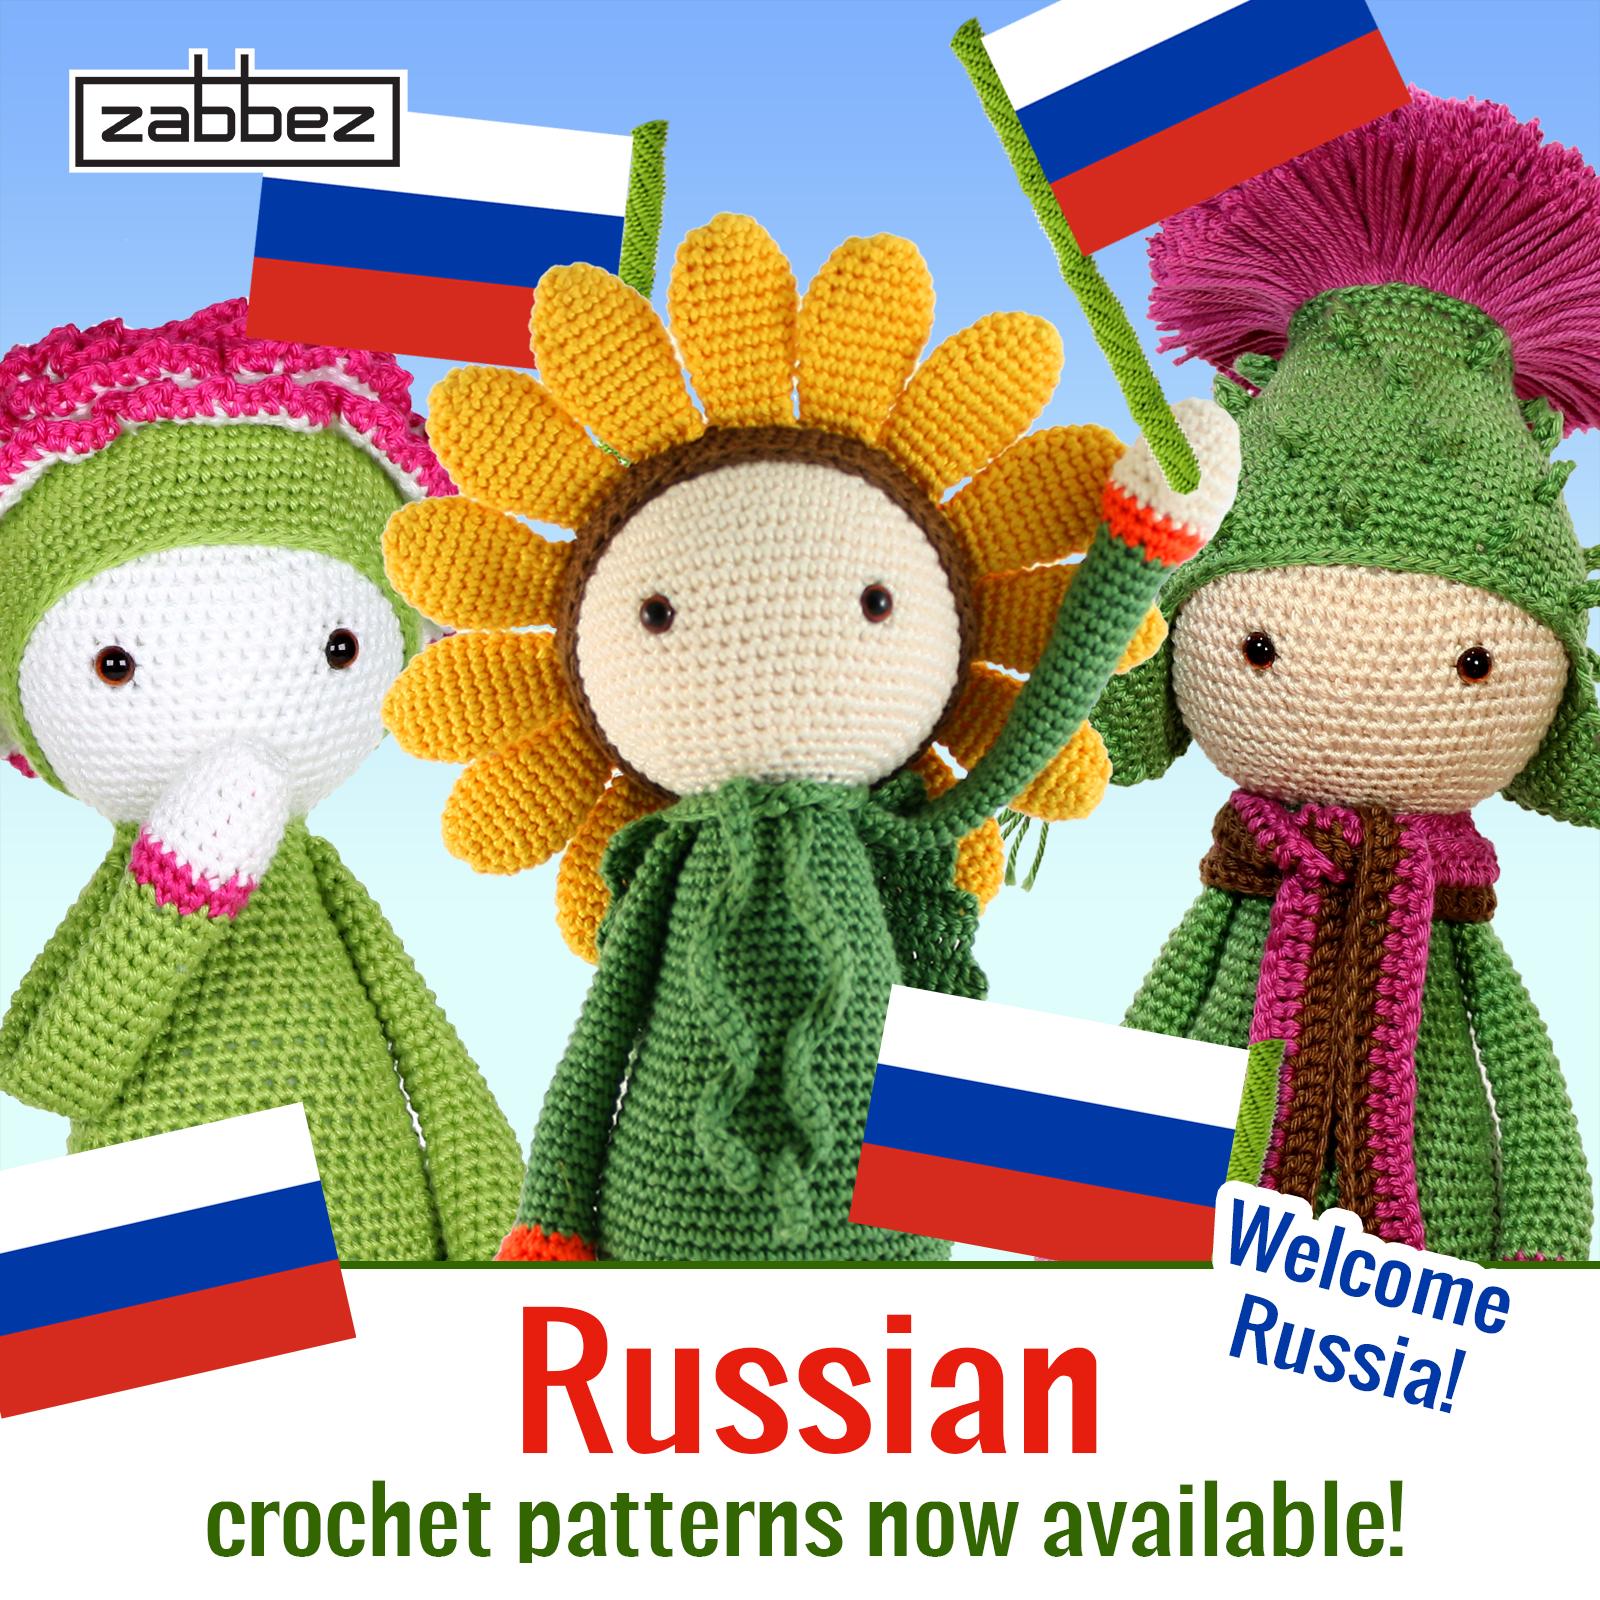 Russian flower crochet patterns